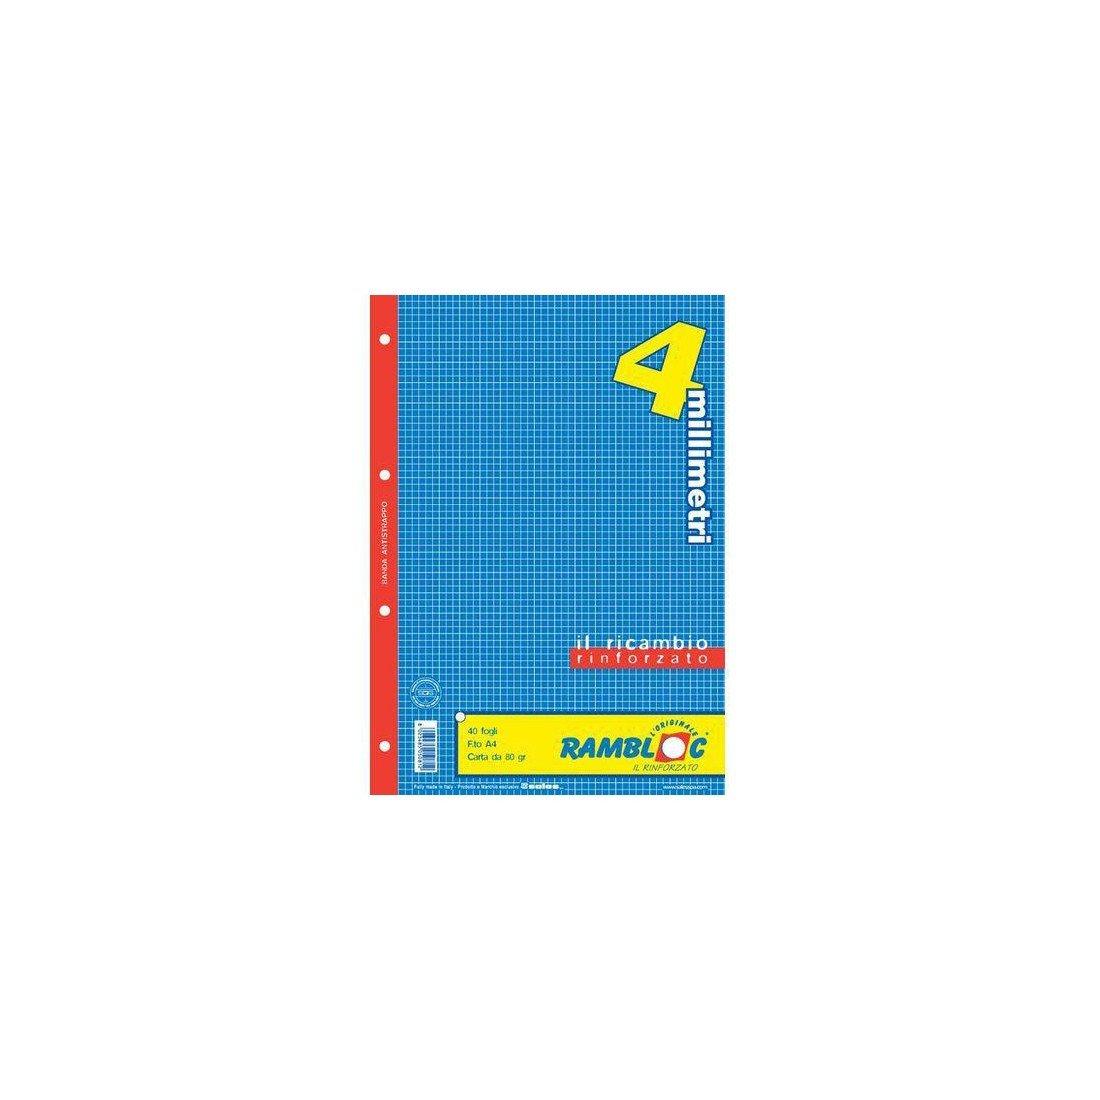 Rambloc Ricambi A4 210 x 297 mm (A4) 40fogli 90505081S